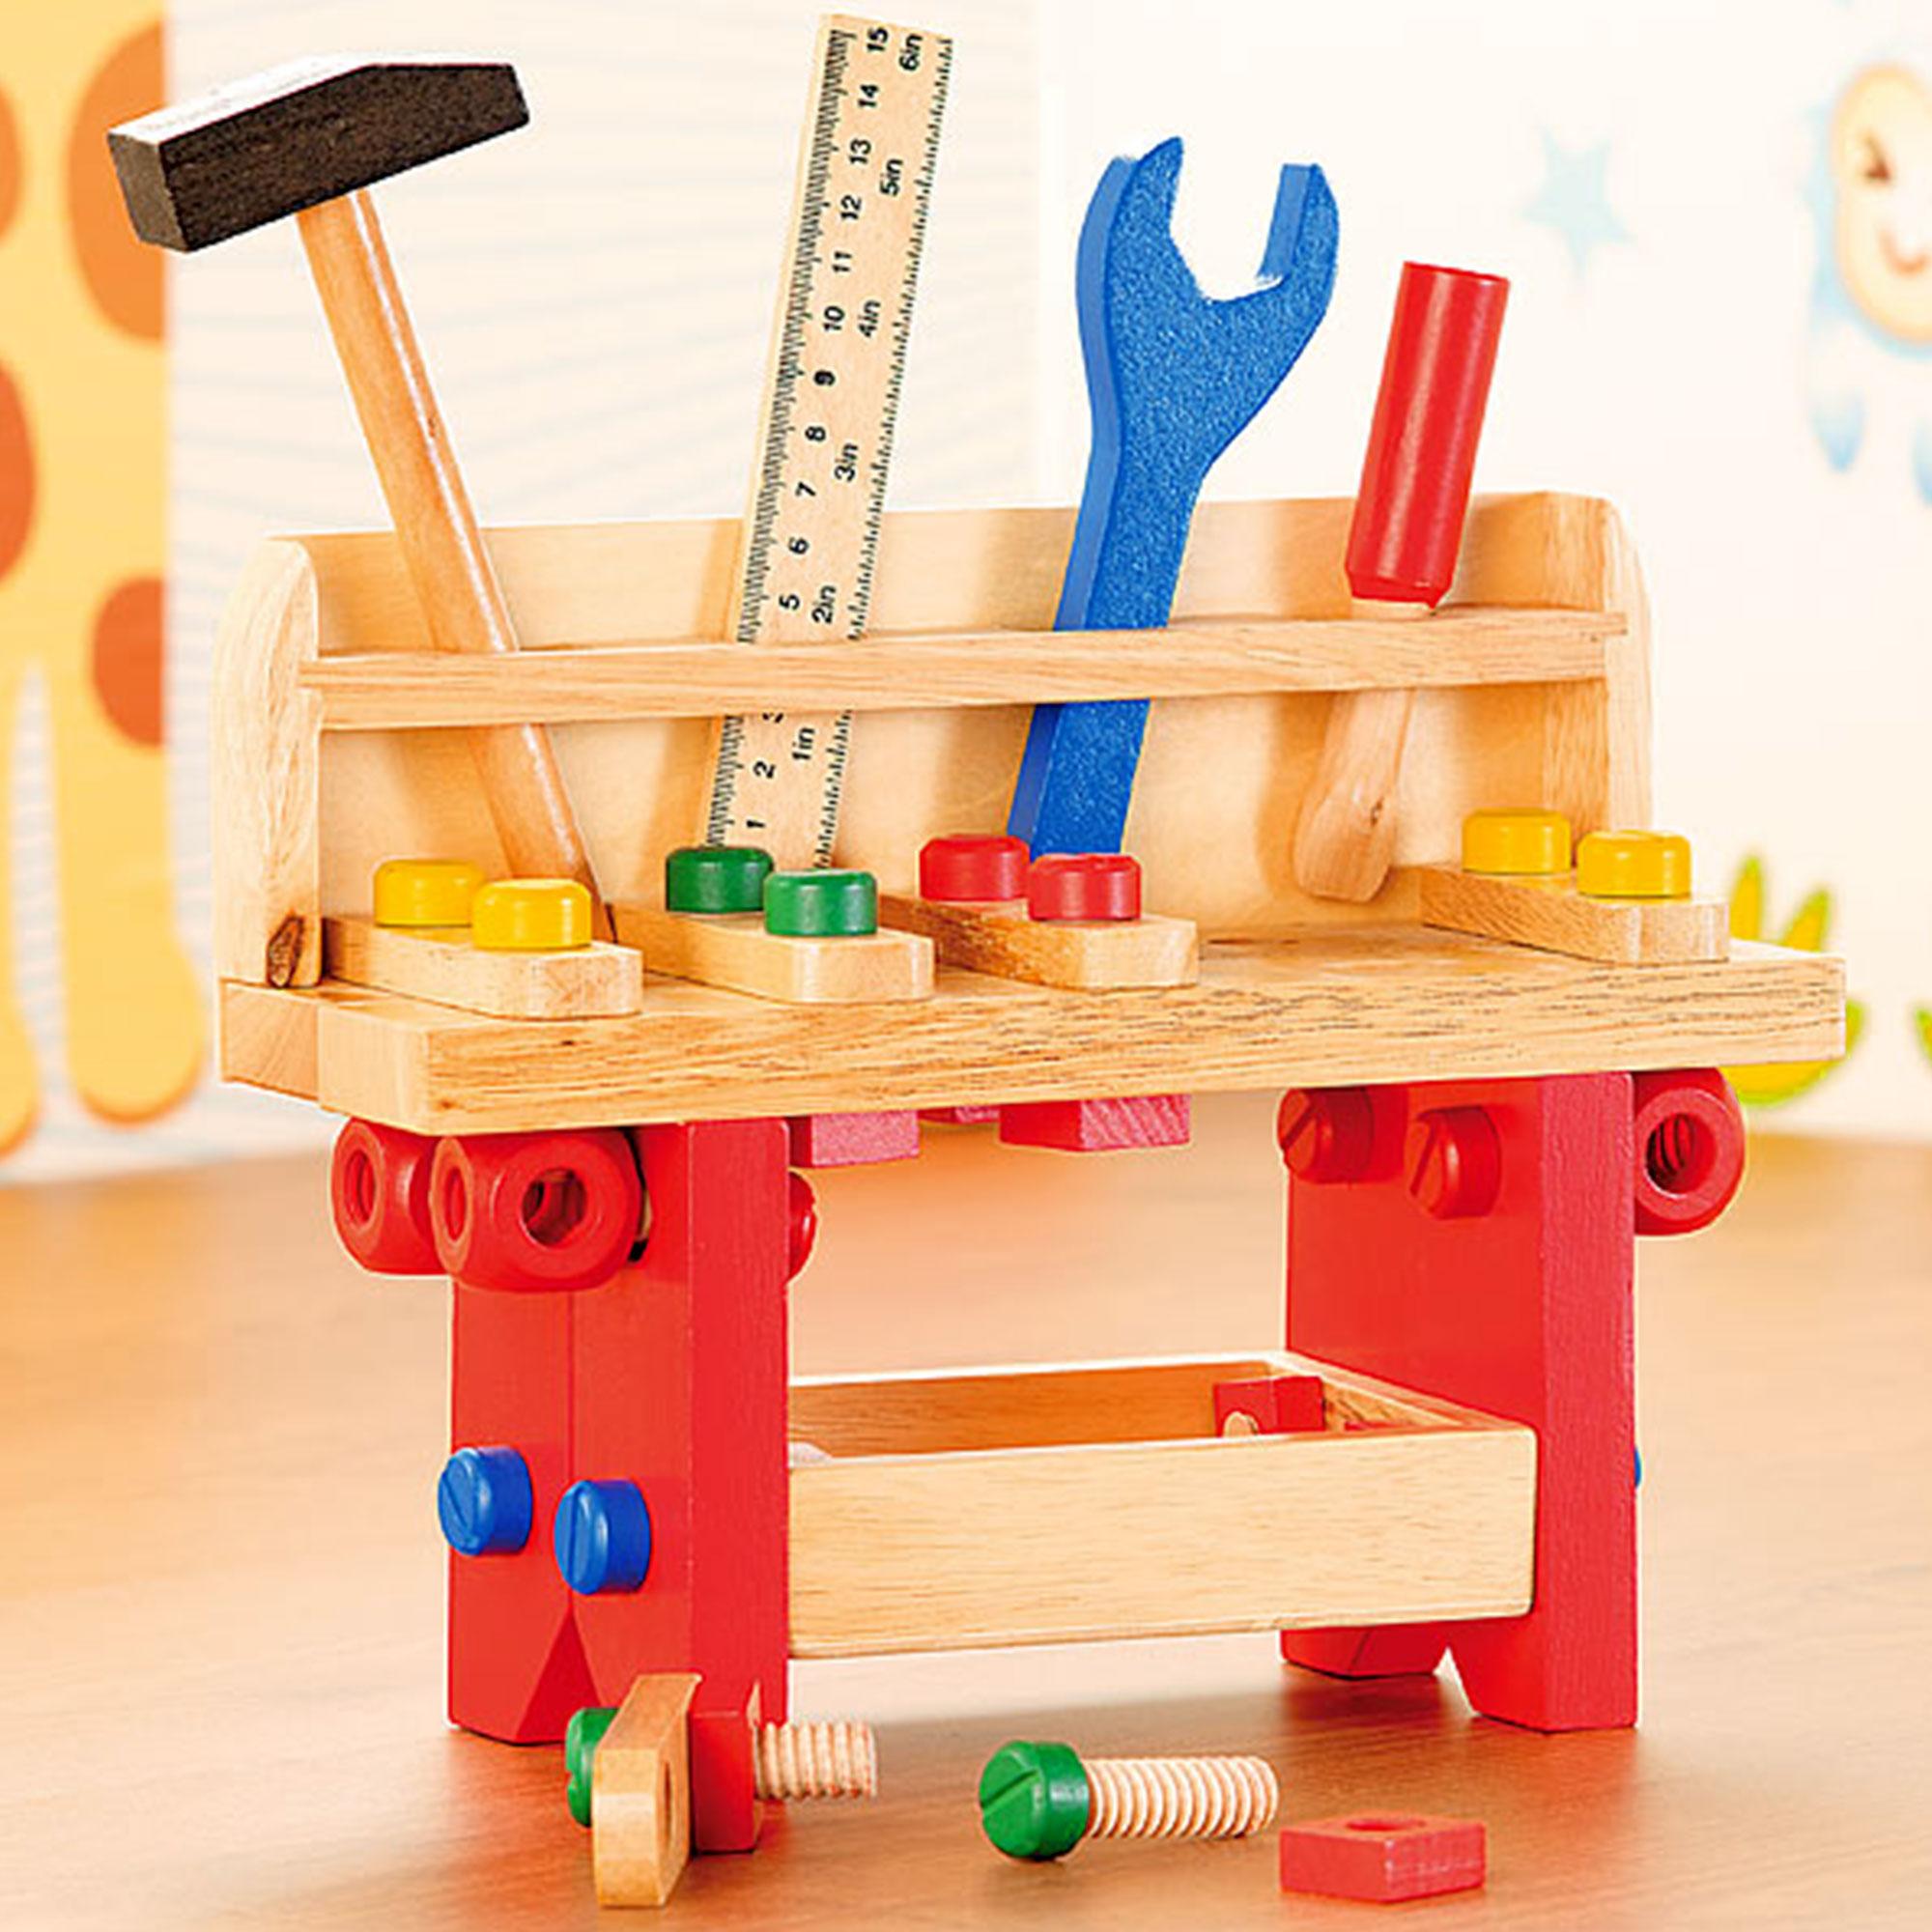 Motorik Spielzeug Fur Kinder Werkbank Aus Holz 51 Teilig